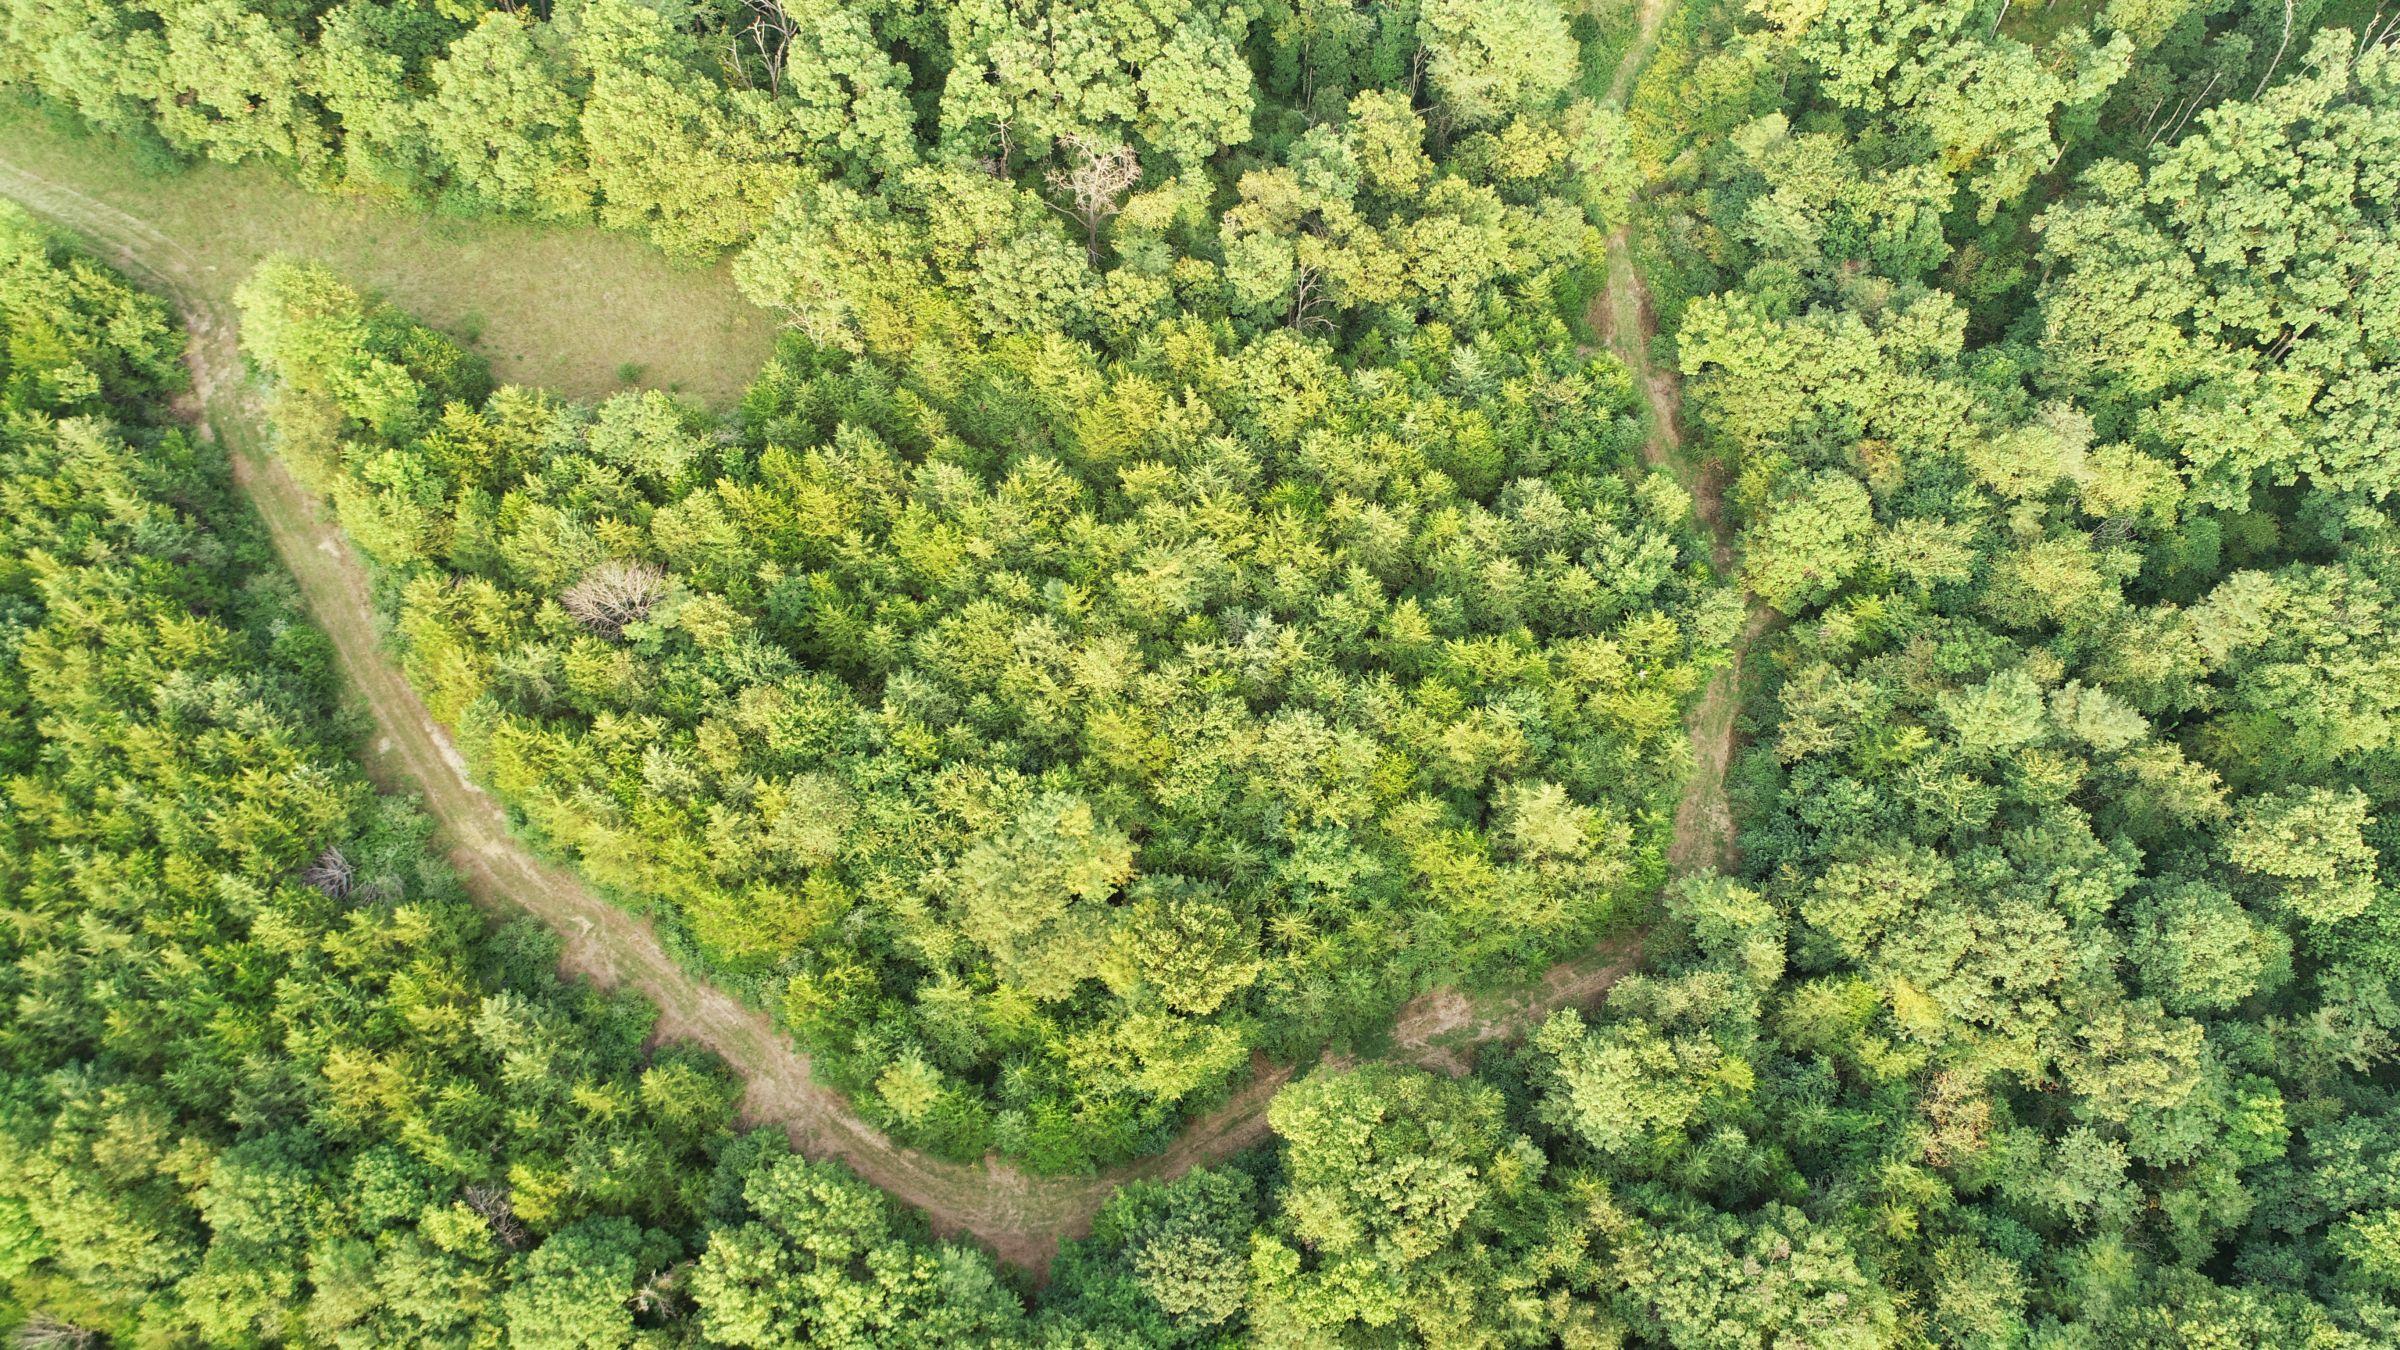 land-lee-county-iowa-328-acres-listing-number-15137-5-2020-08-27-175034.jpg